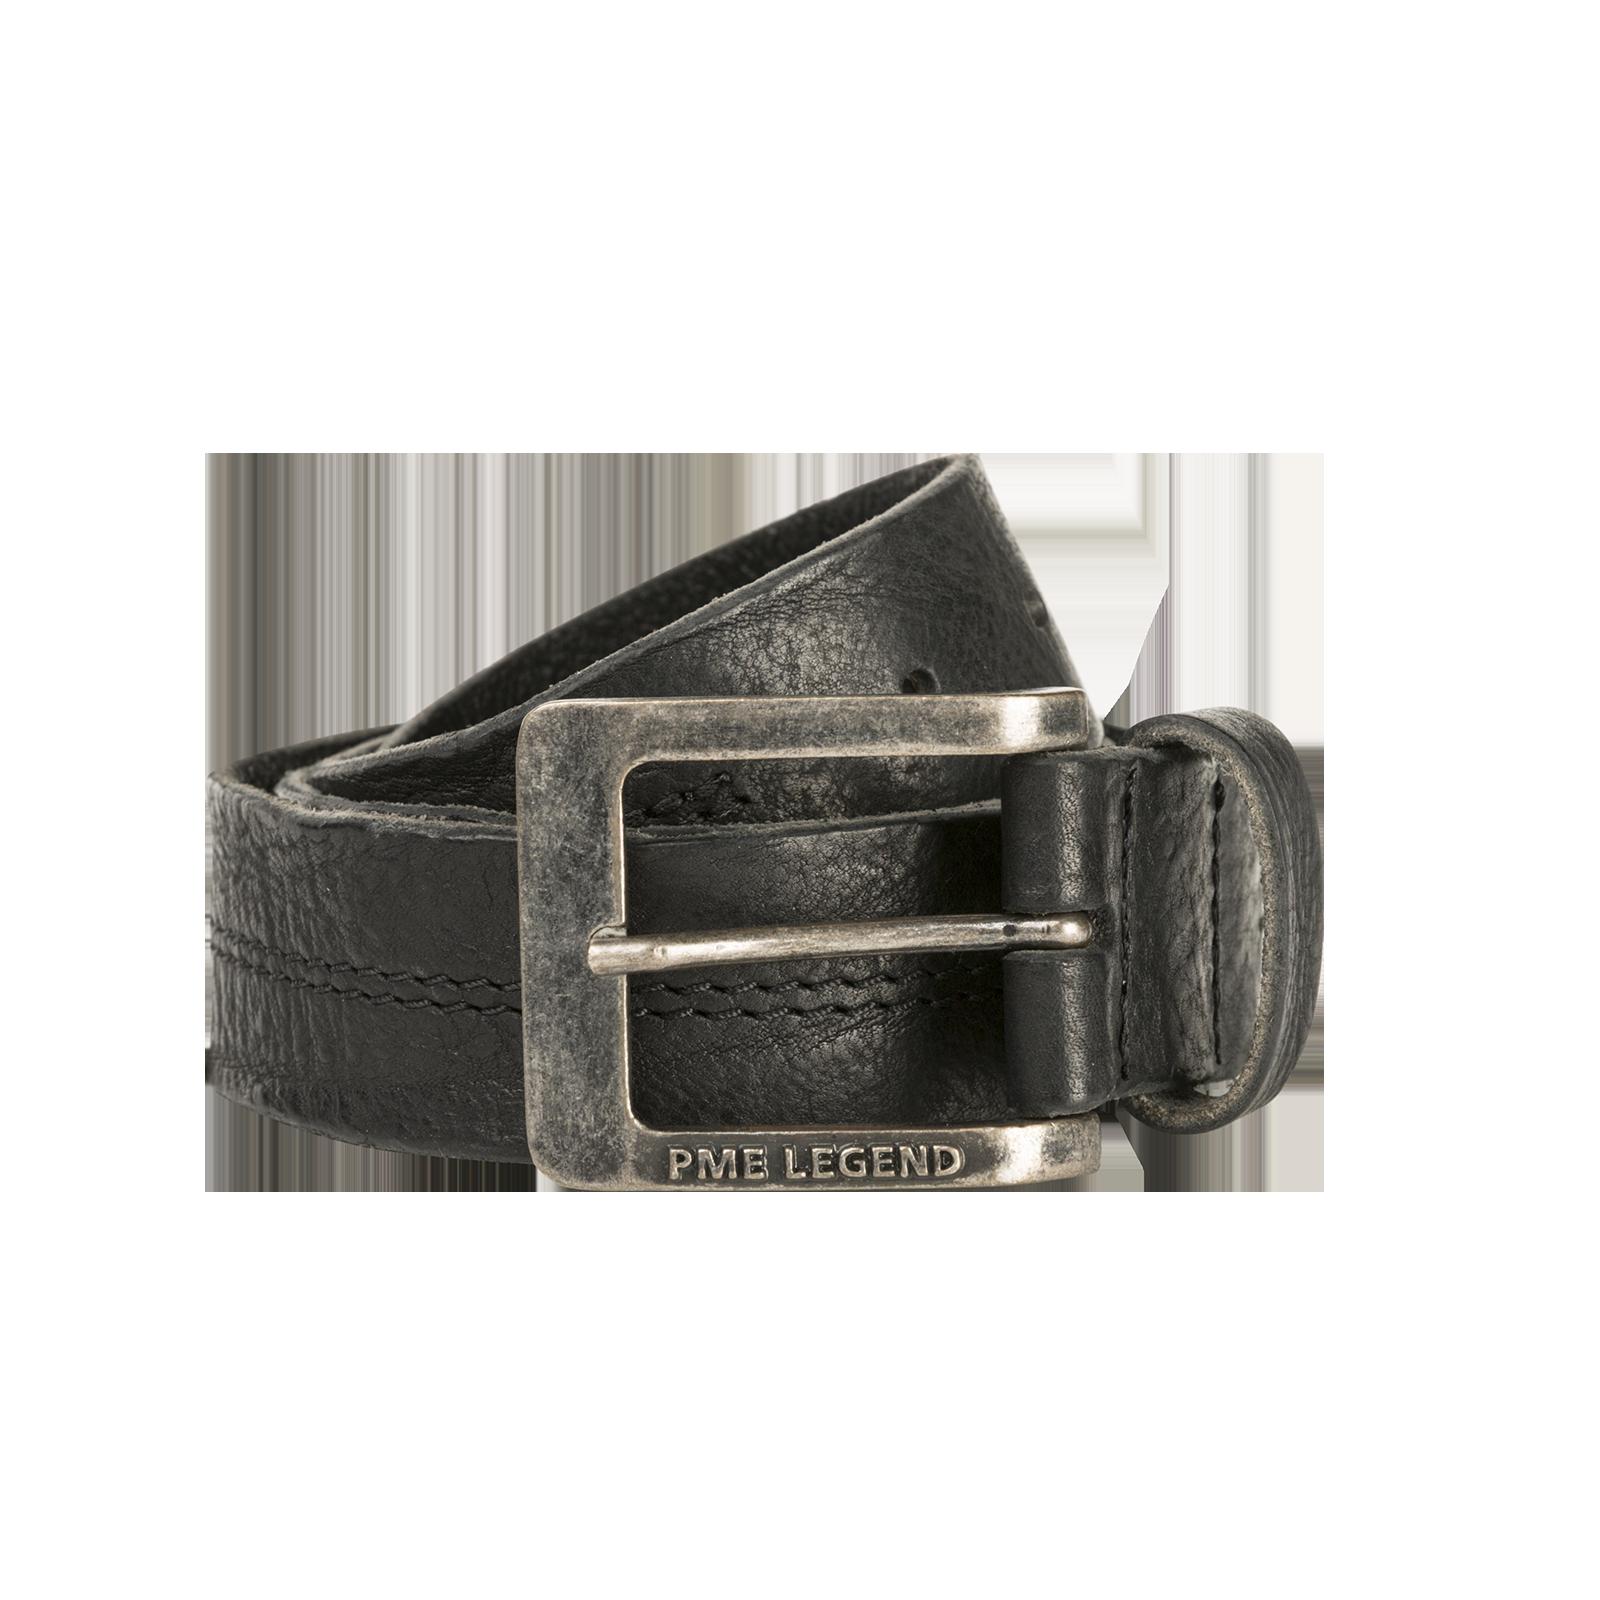 PME Legend PBE00112 999 PME Legend belt leather center stich Black